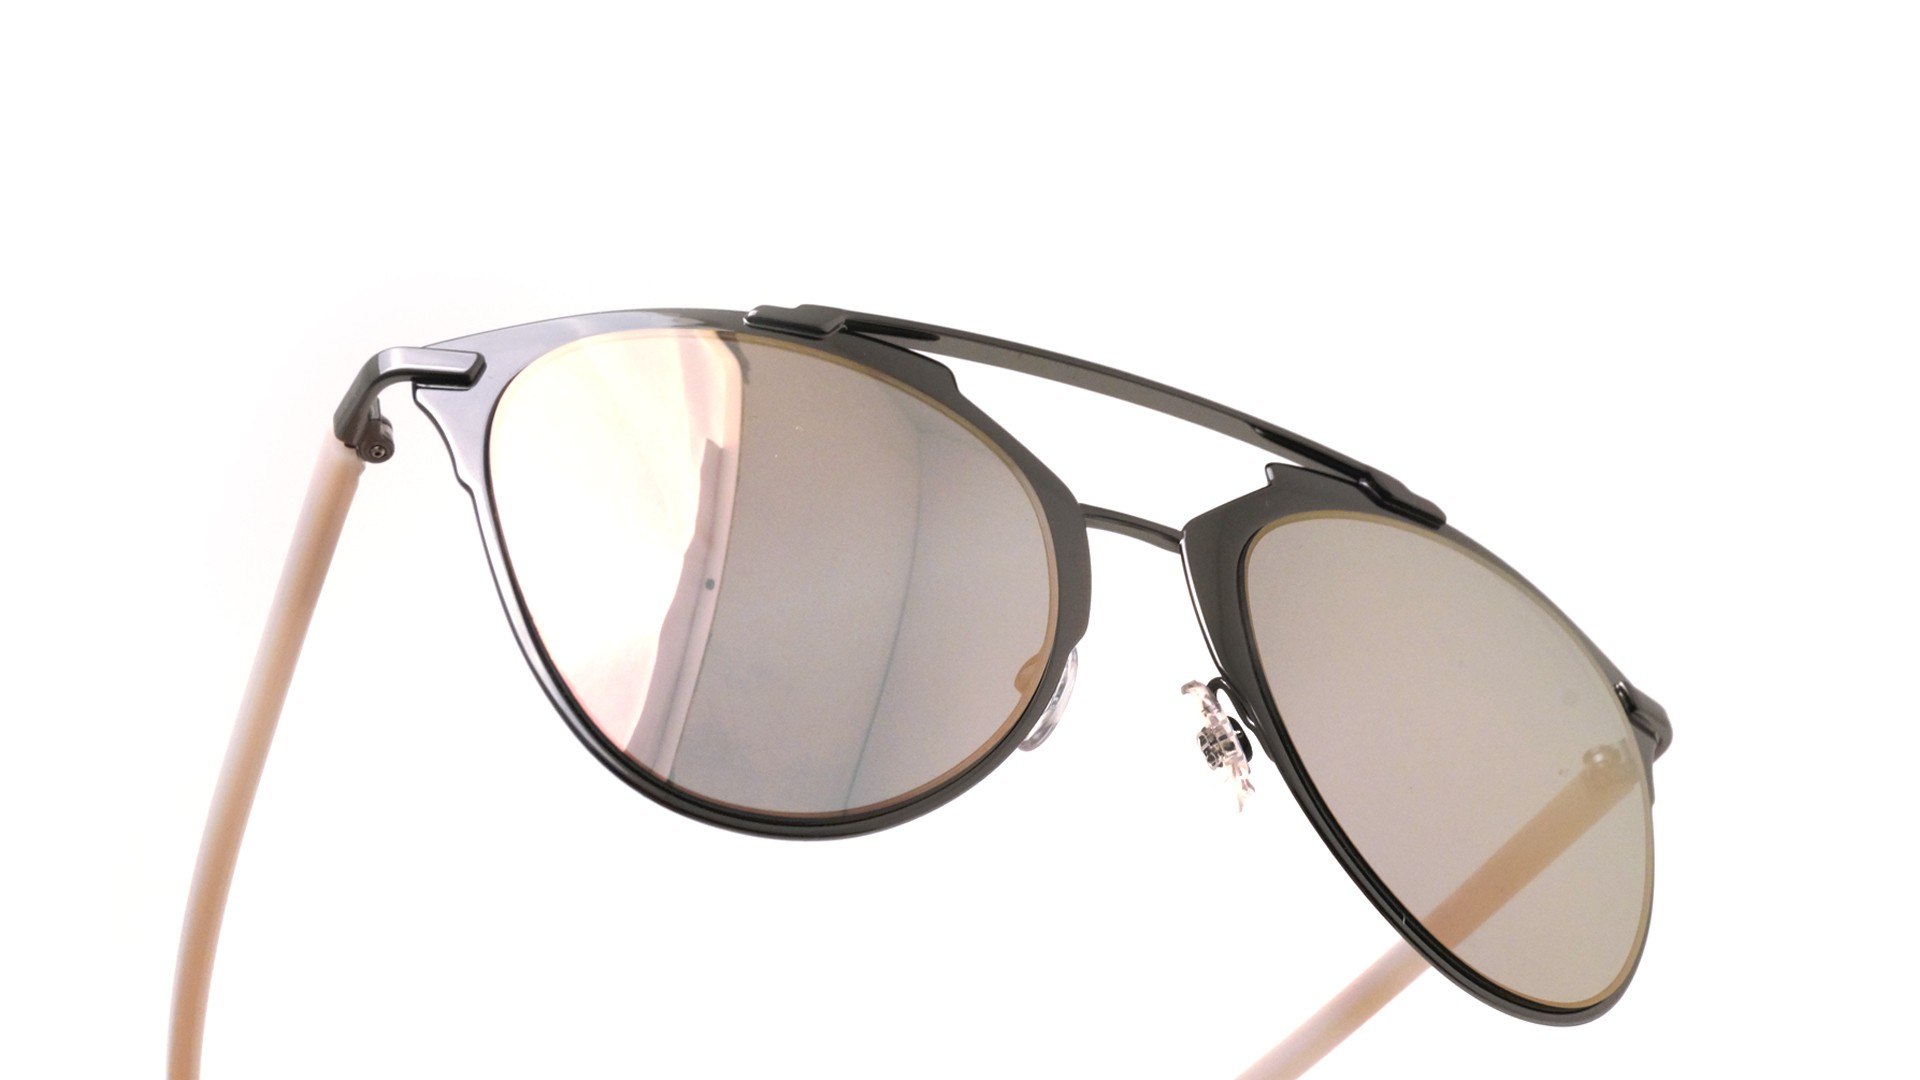 5b252dc58ec4 Sunglasses Dior Reflected Silver REFLECTED XY20J 52-21 Medium Mirror